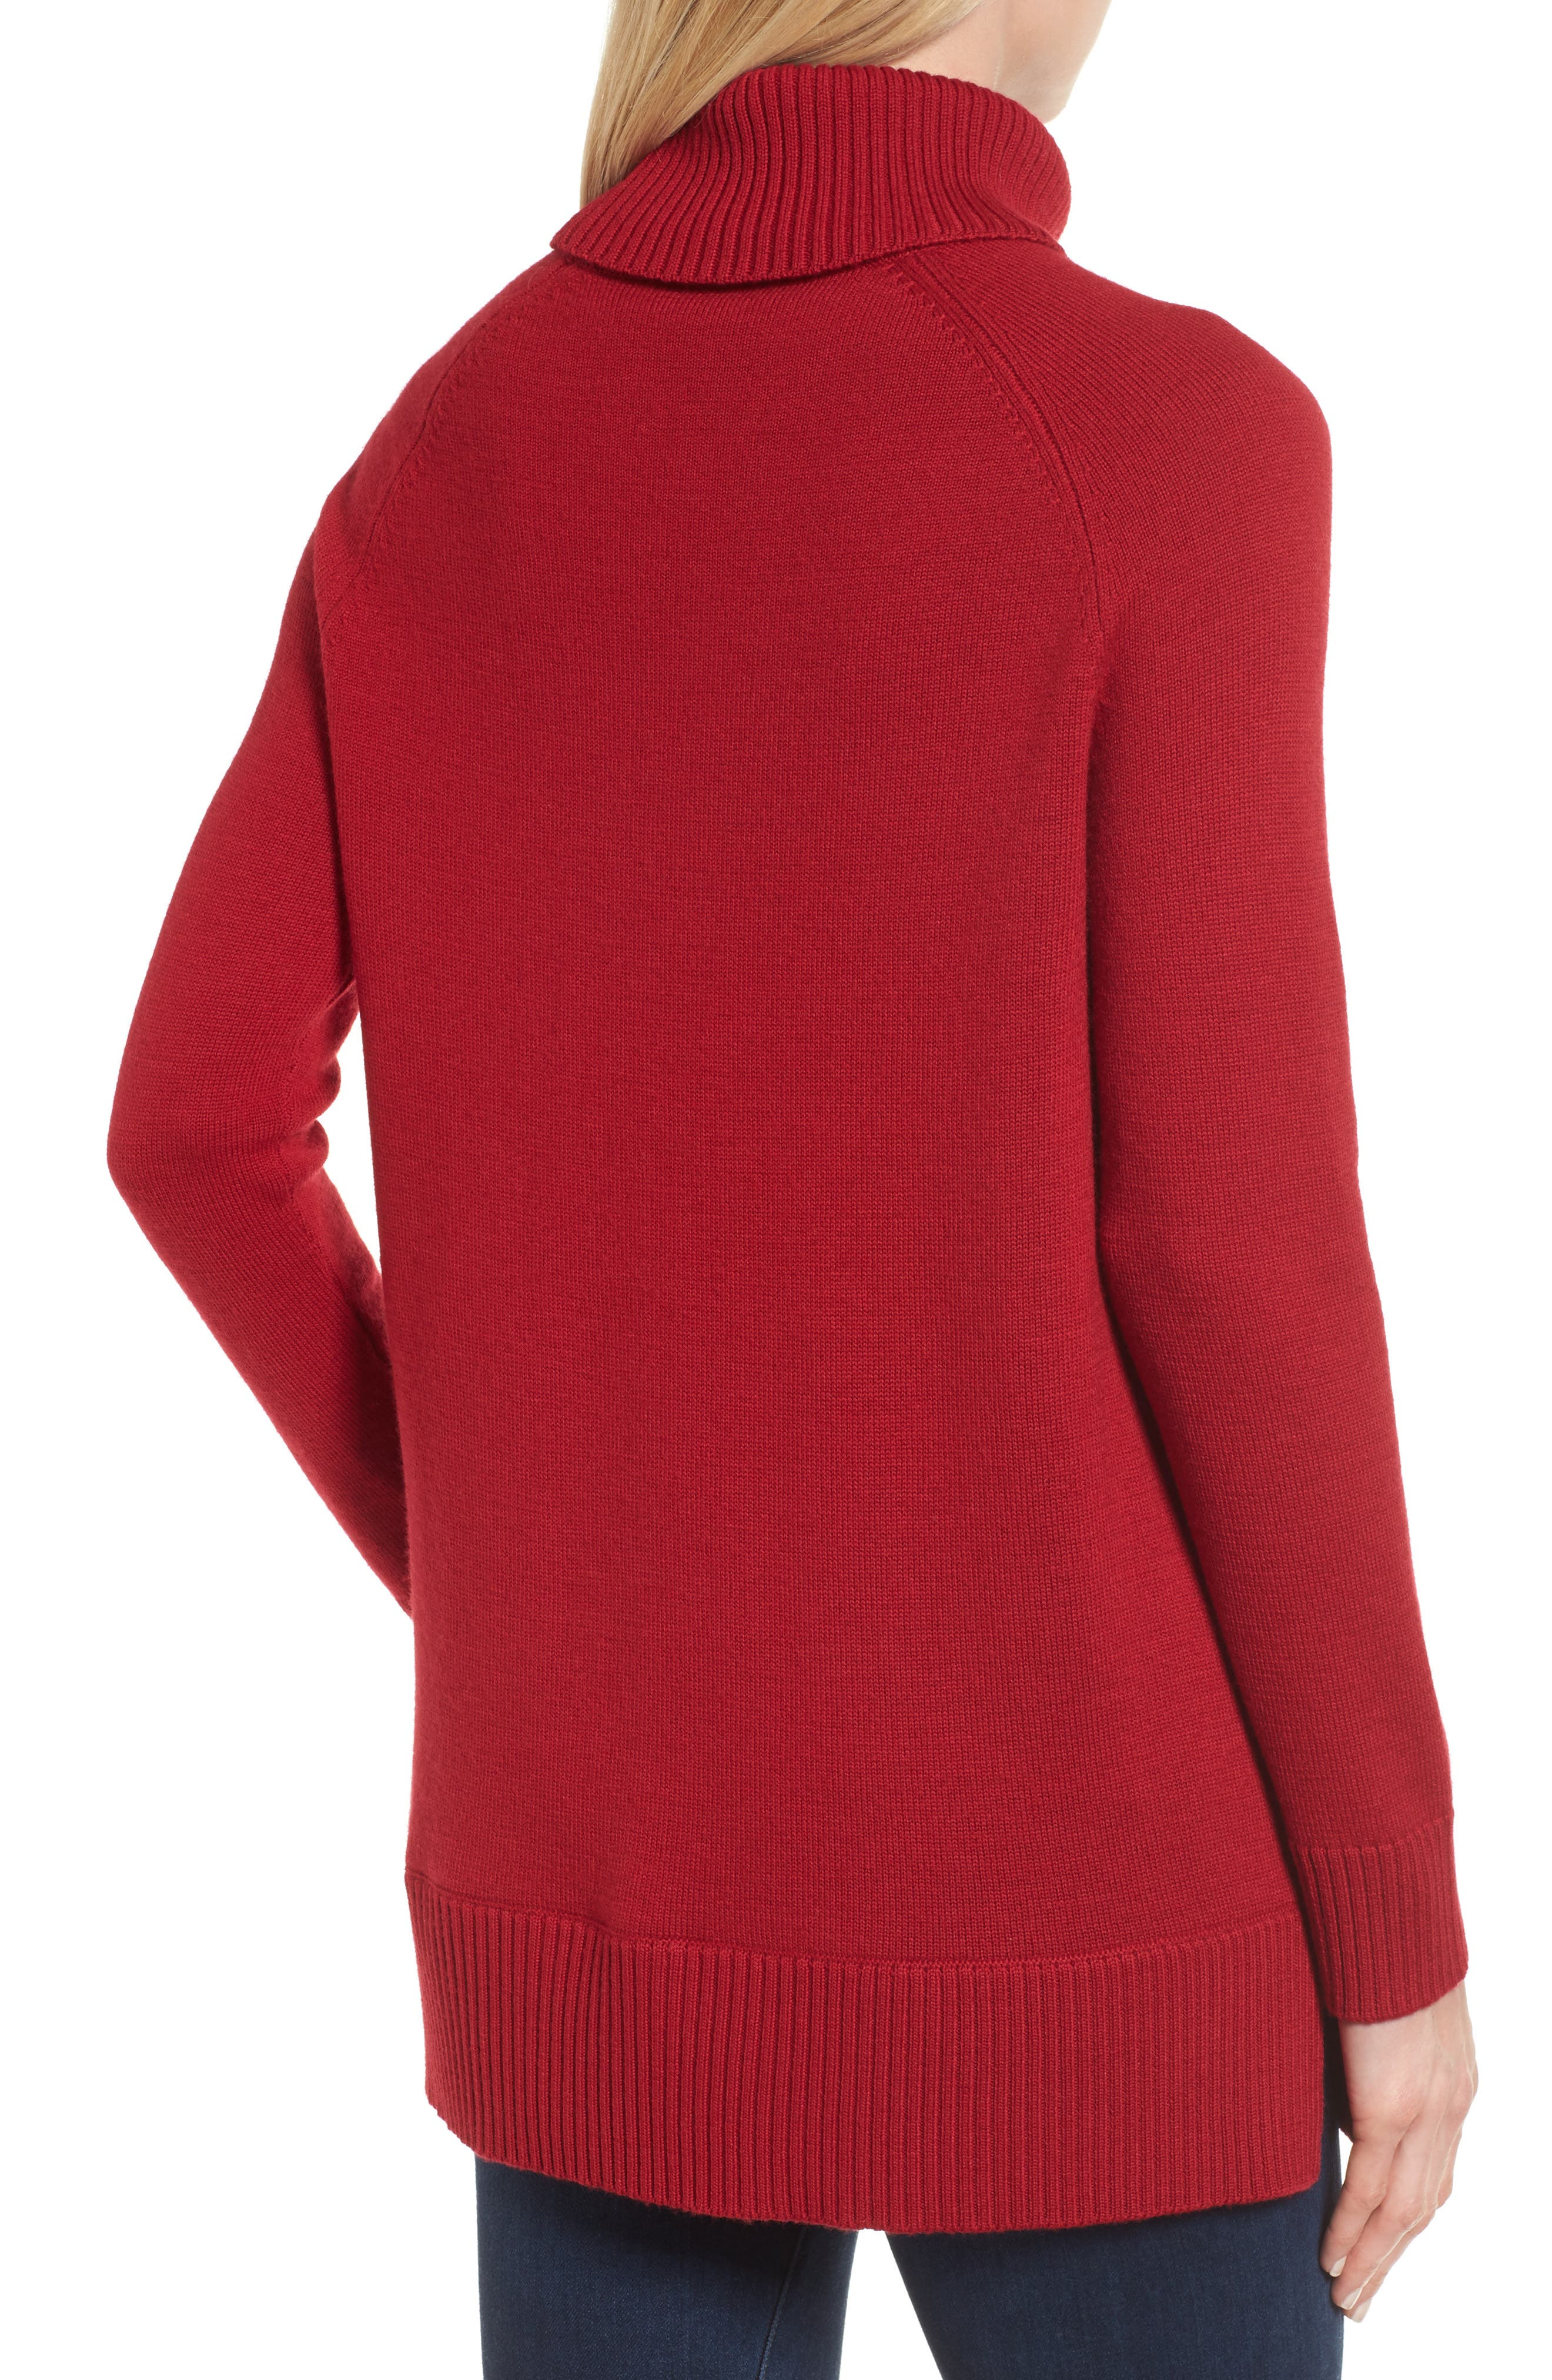 Tessa Turtleneck Wool Maternity Sweater,                             Alternate thumbnail 2, color,                             600